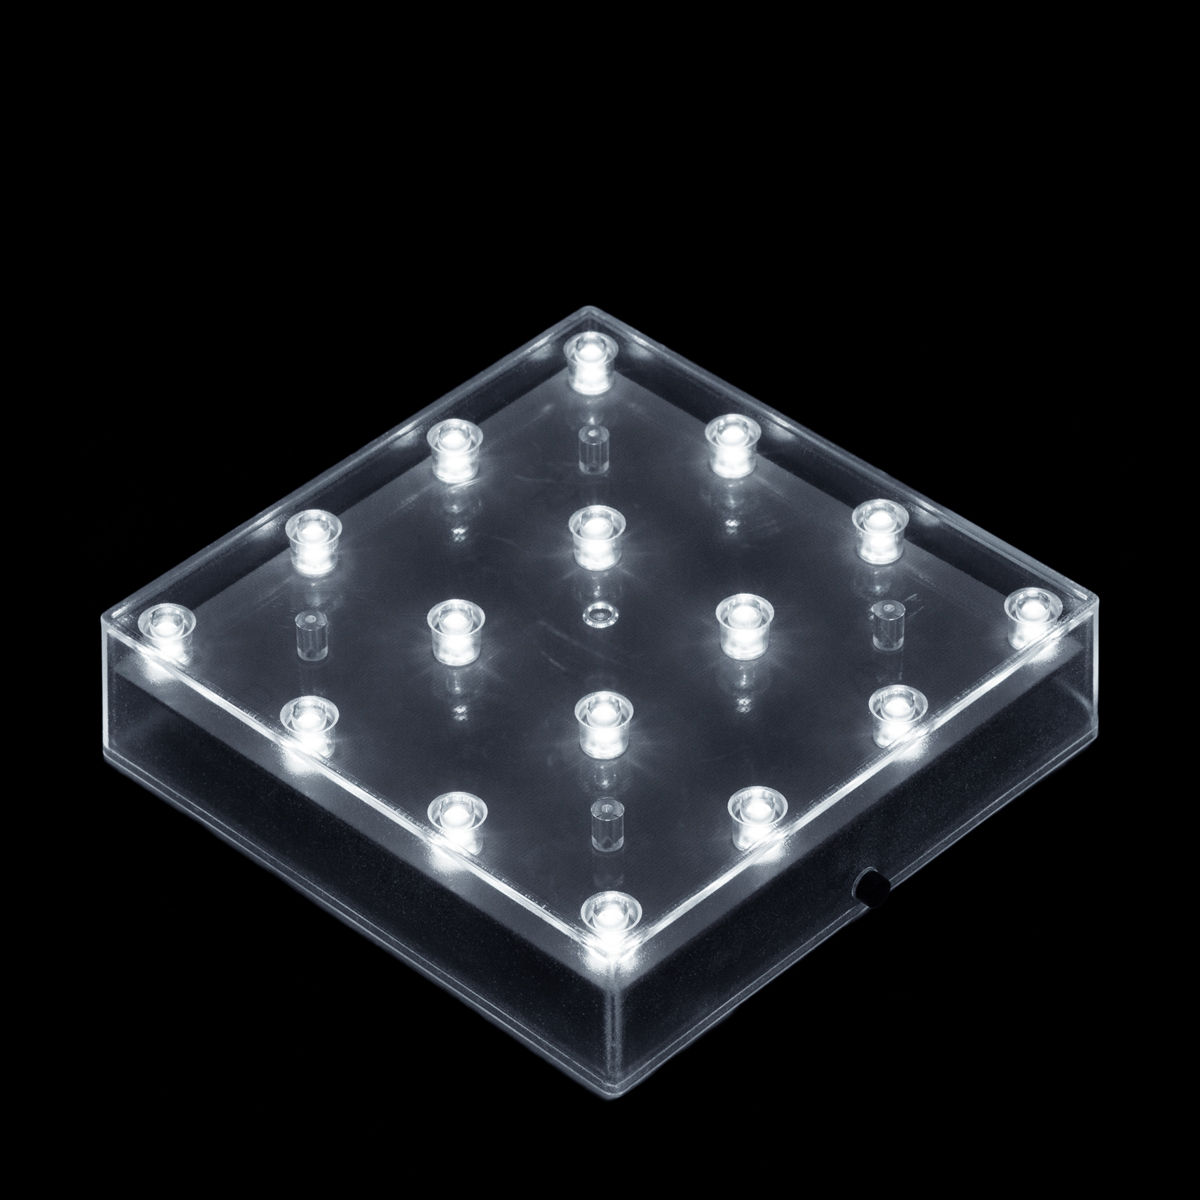 Inch square led lightbase battery operated light base